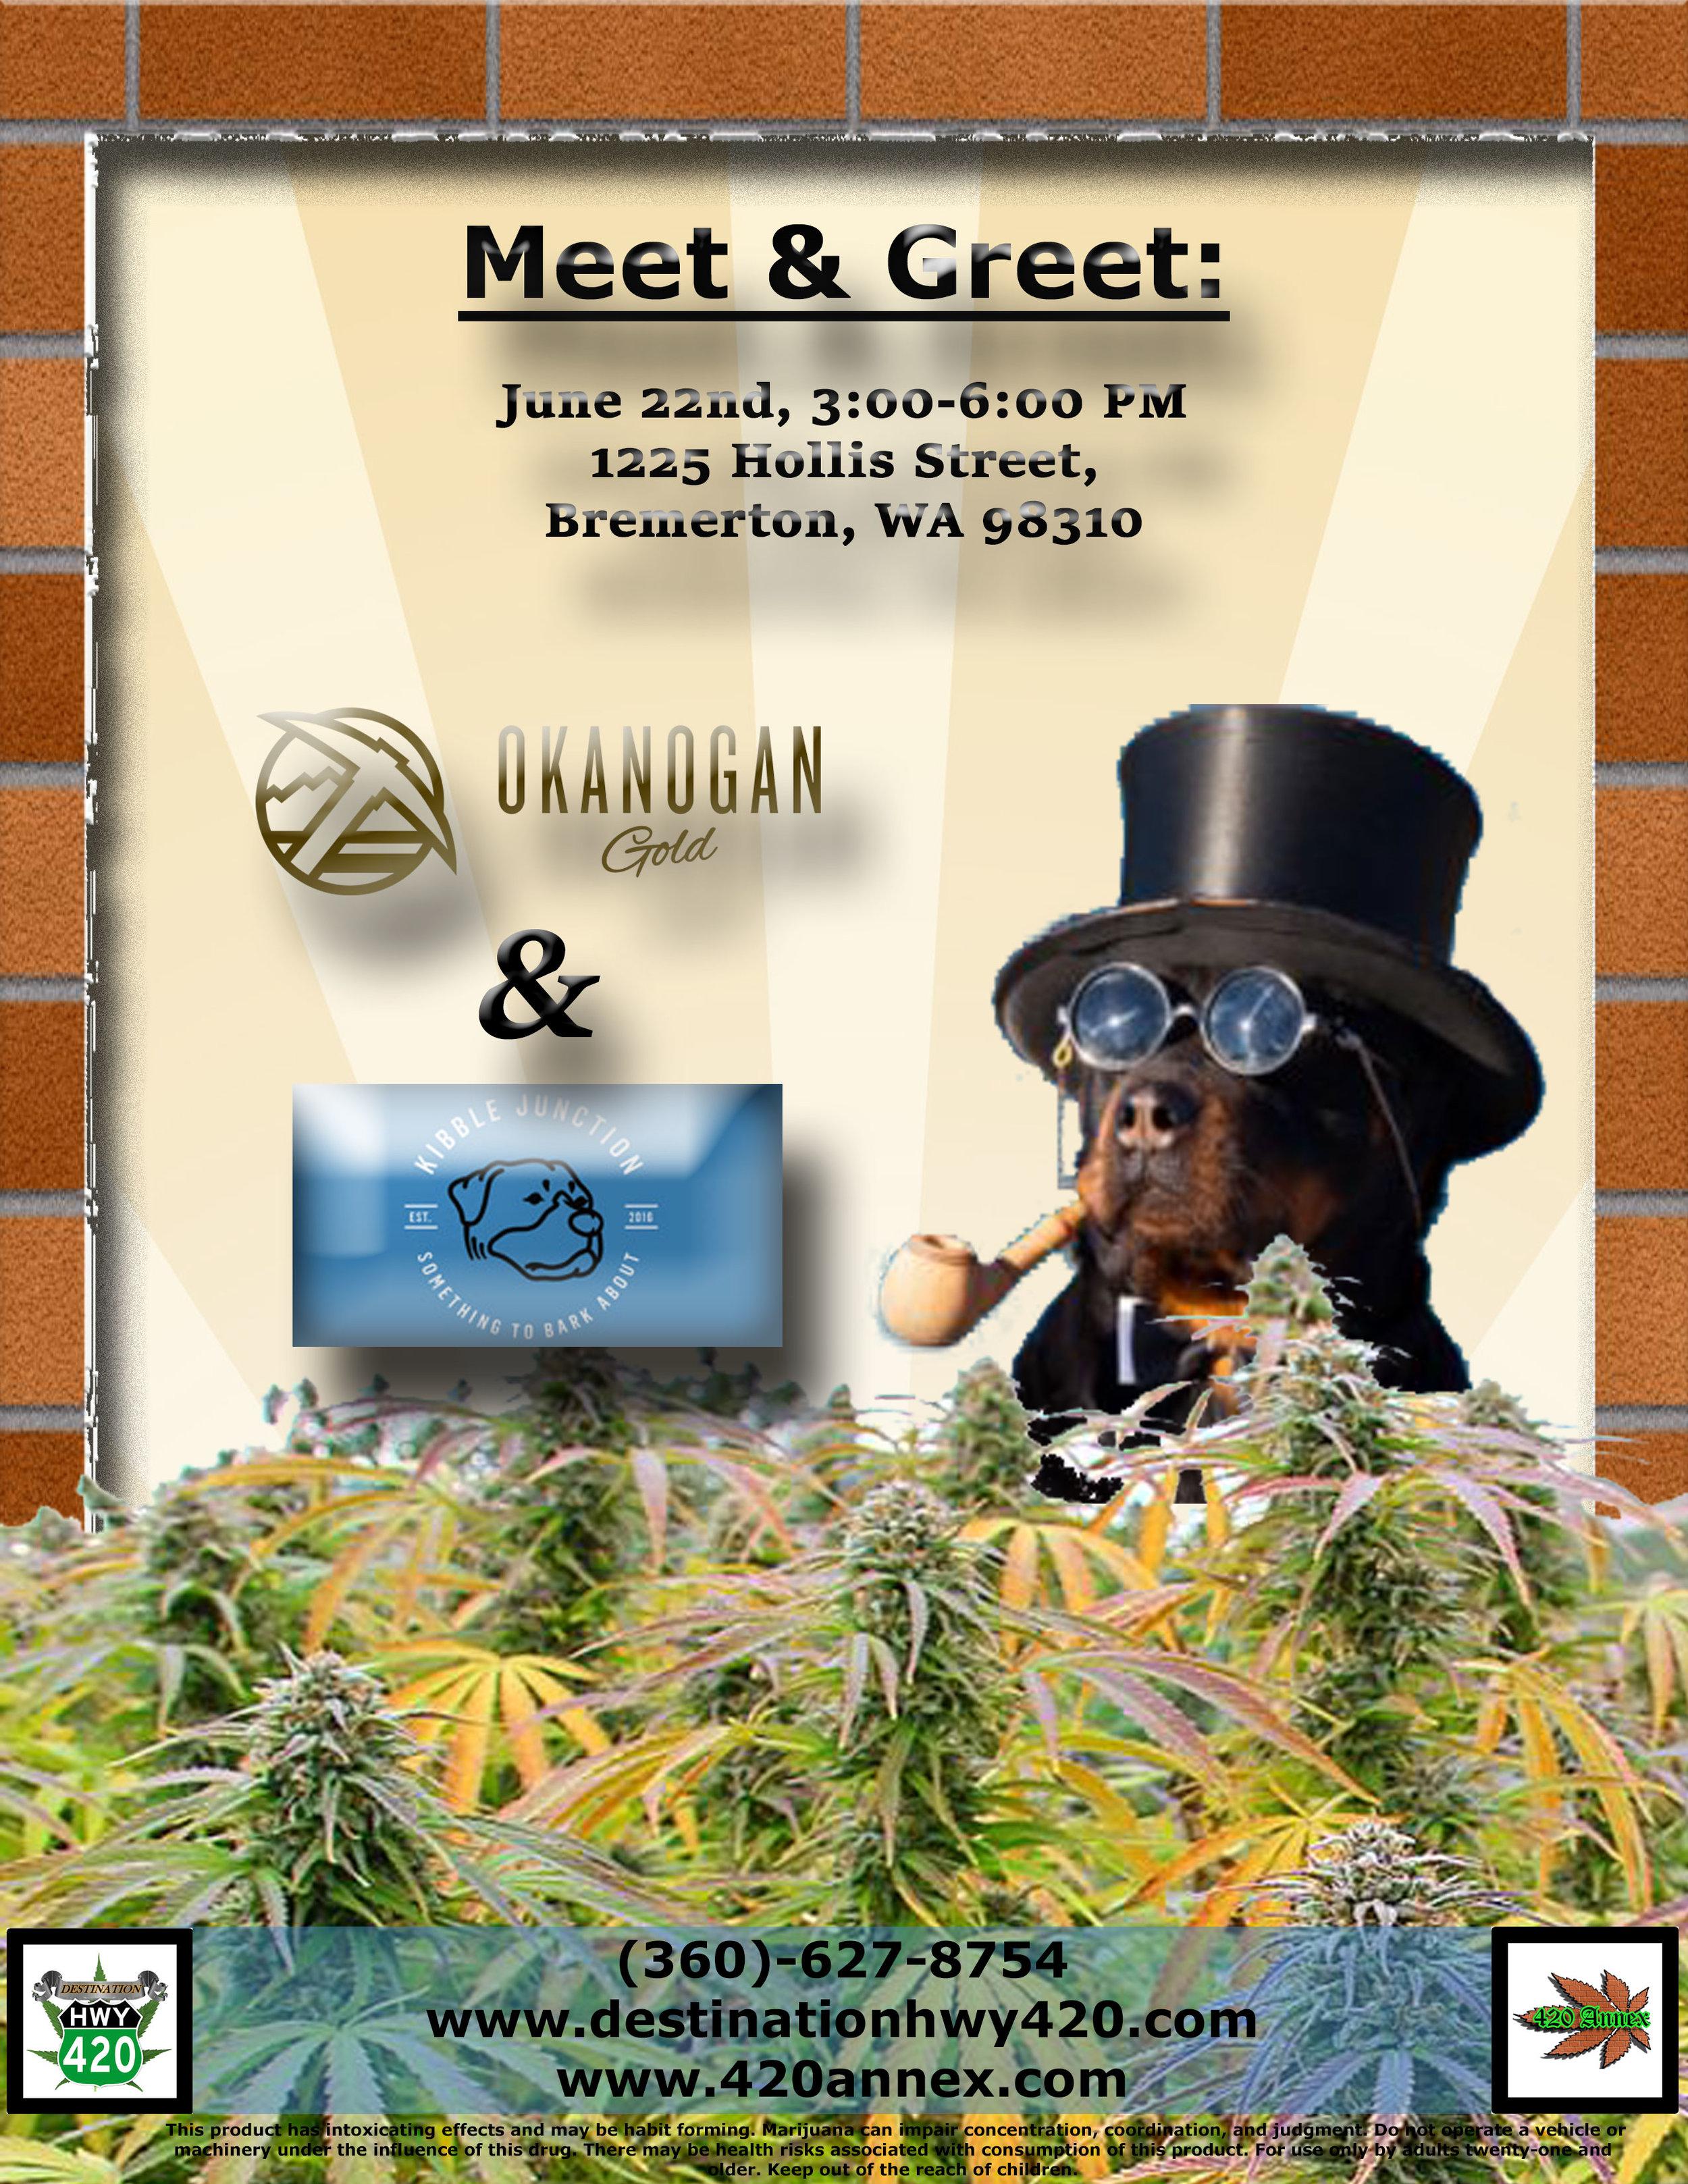 Okanogan-&-Kibble-Junction-Meet-&-Greet.jpg